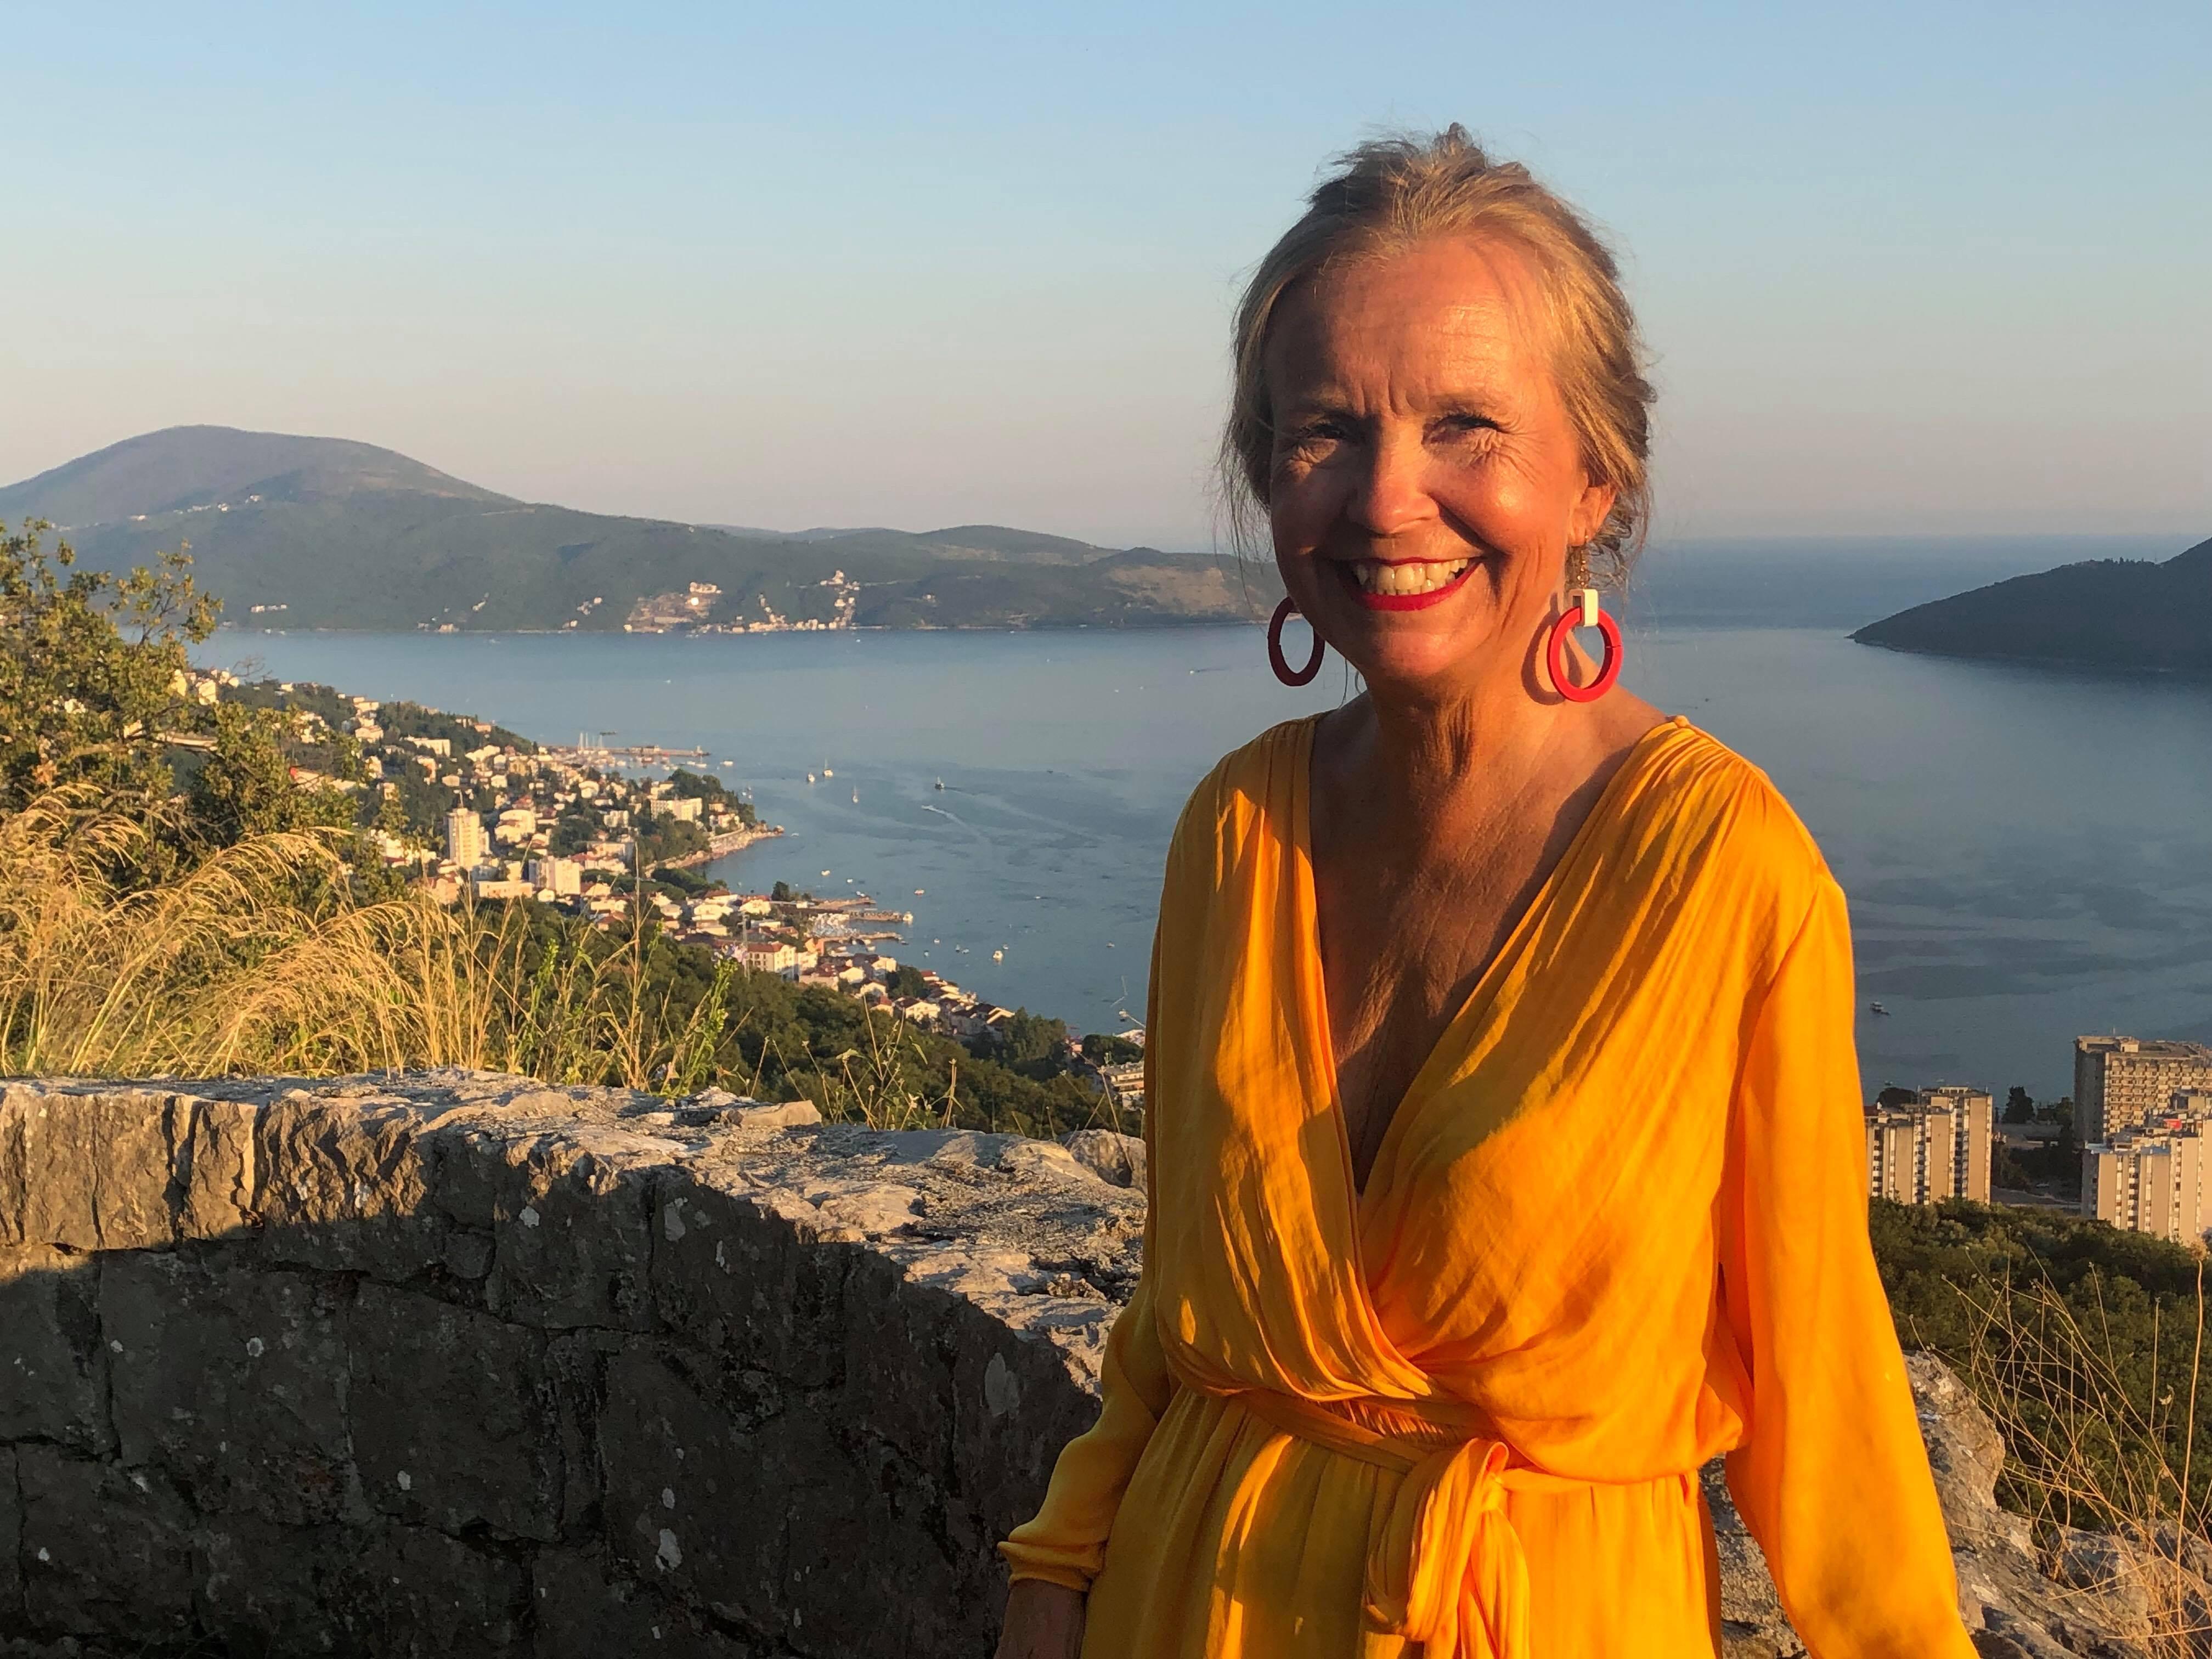 Spiritual Healer Silja Winther Announces Digital Course on Meditation for Self-Healing